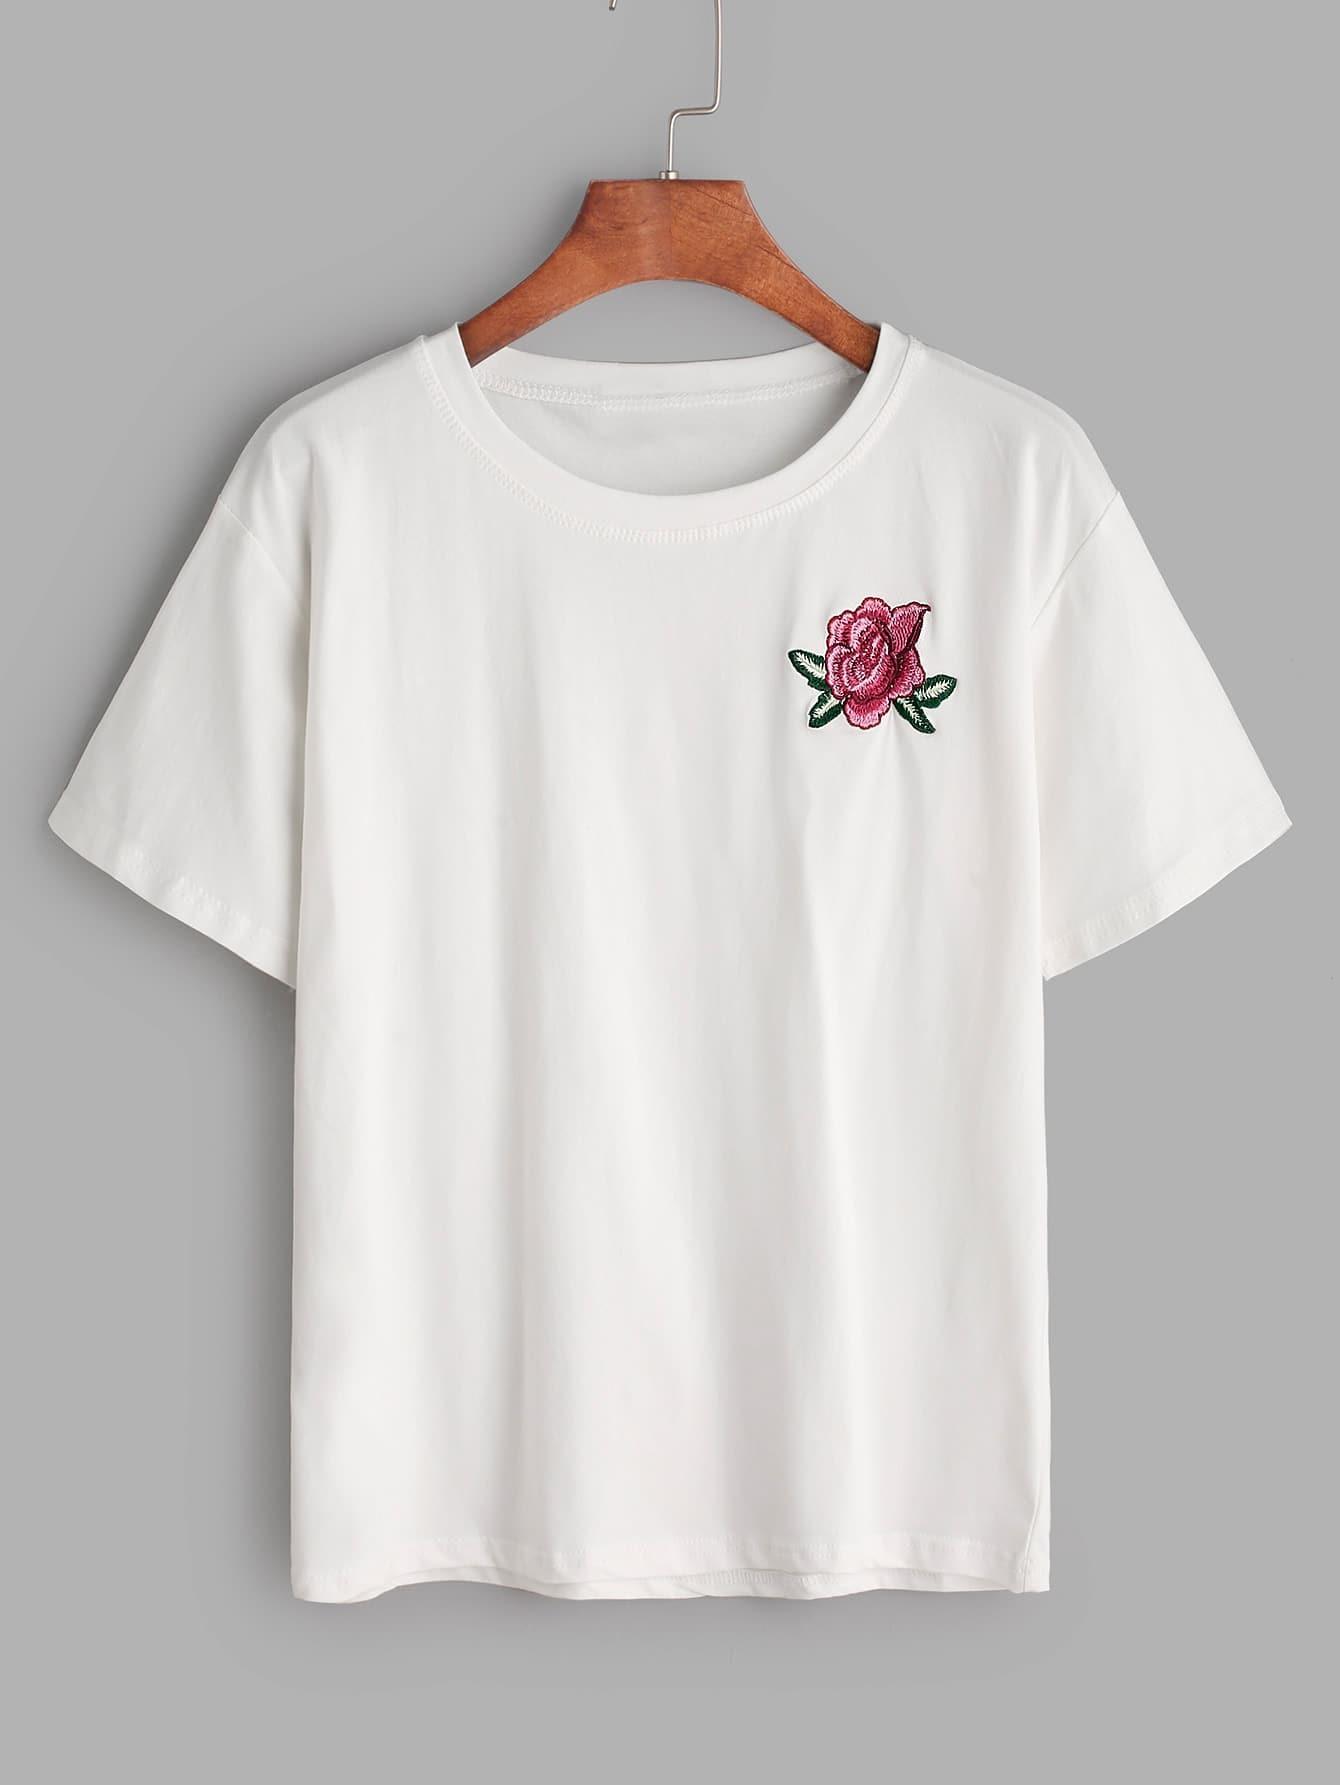 Flower Embroidery Tee Sheinsheinside